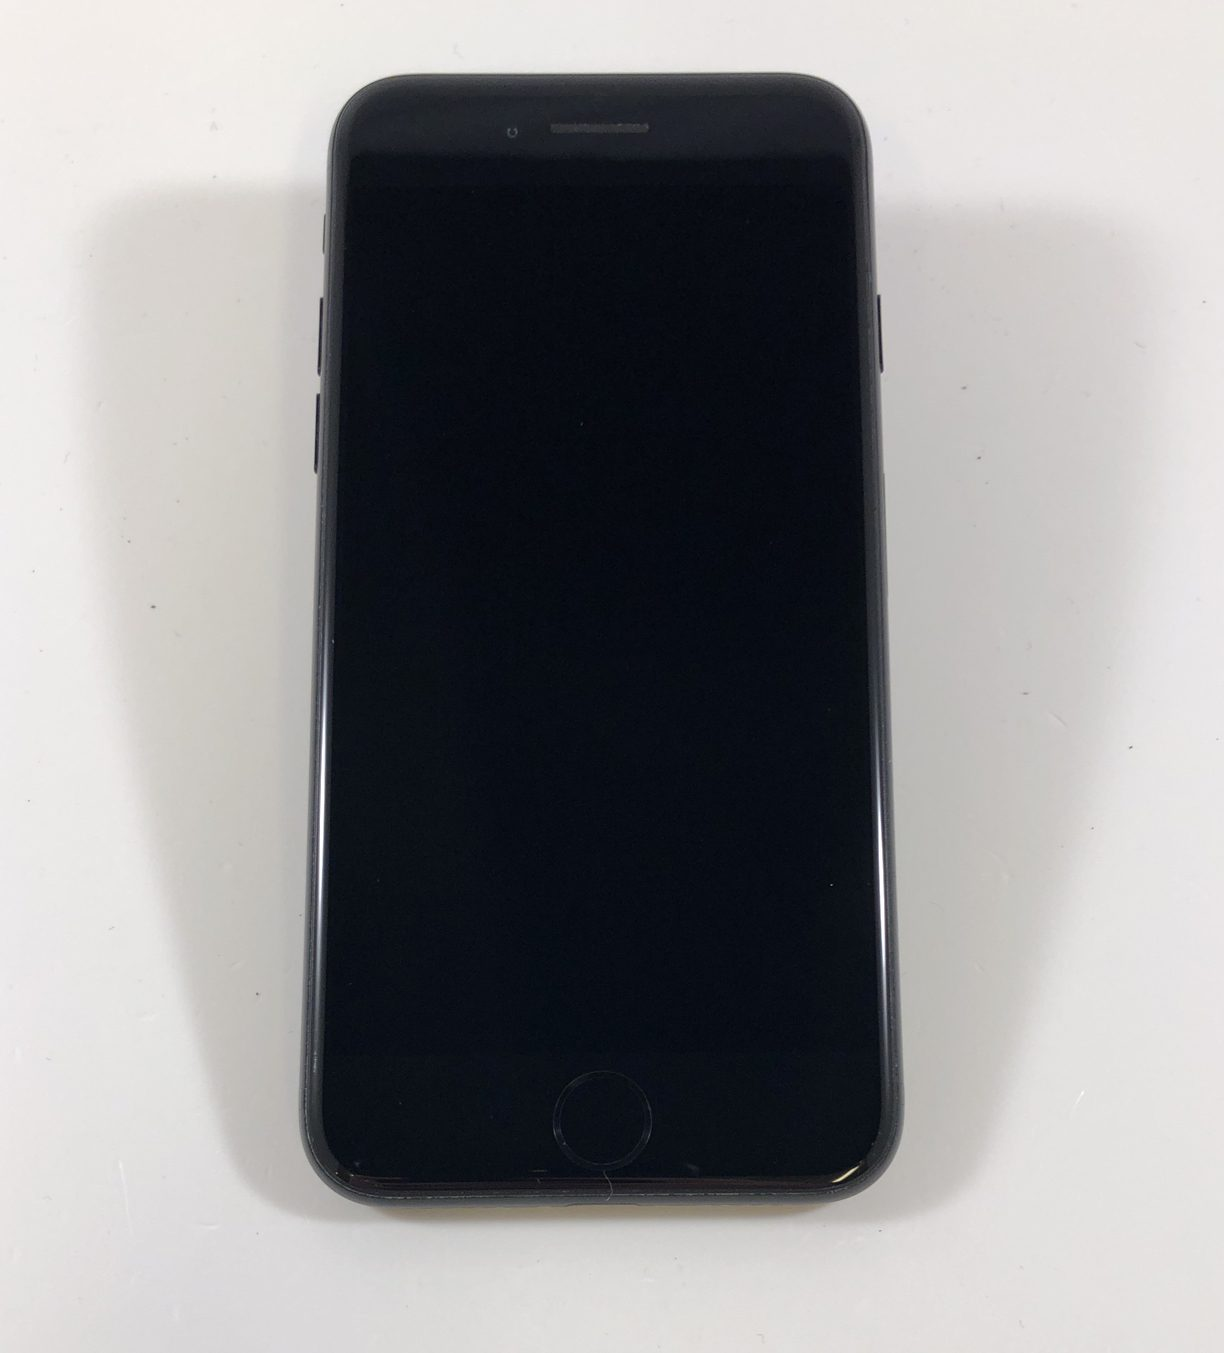 iPhone 7 128GB, 128GB, Black, Kuva 1